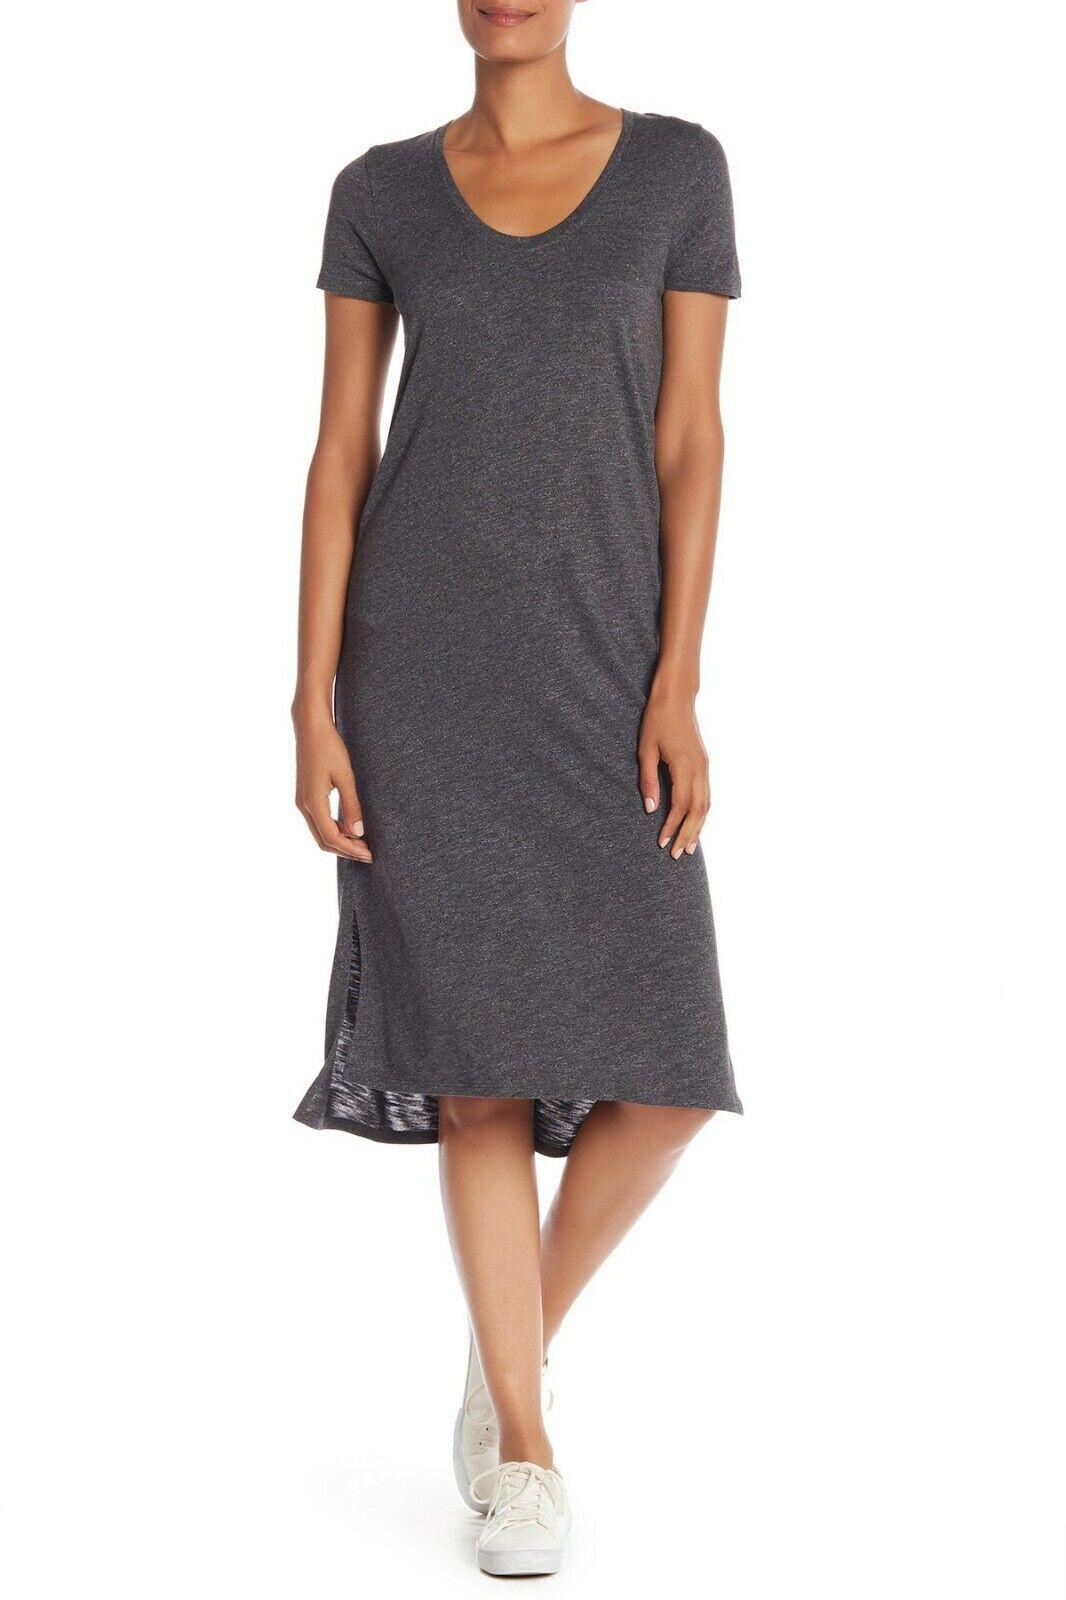 NEW  Madewell Scoop Neck Midi Dress in Heather grau [SZ XL ]  C895